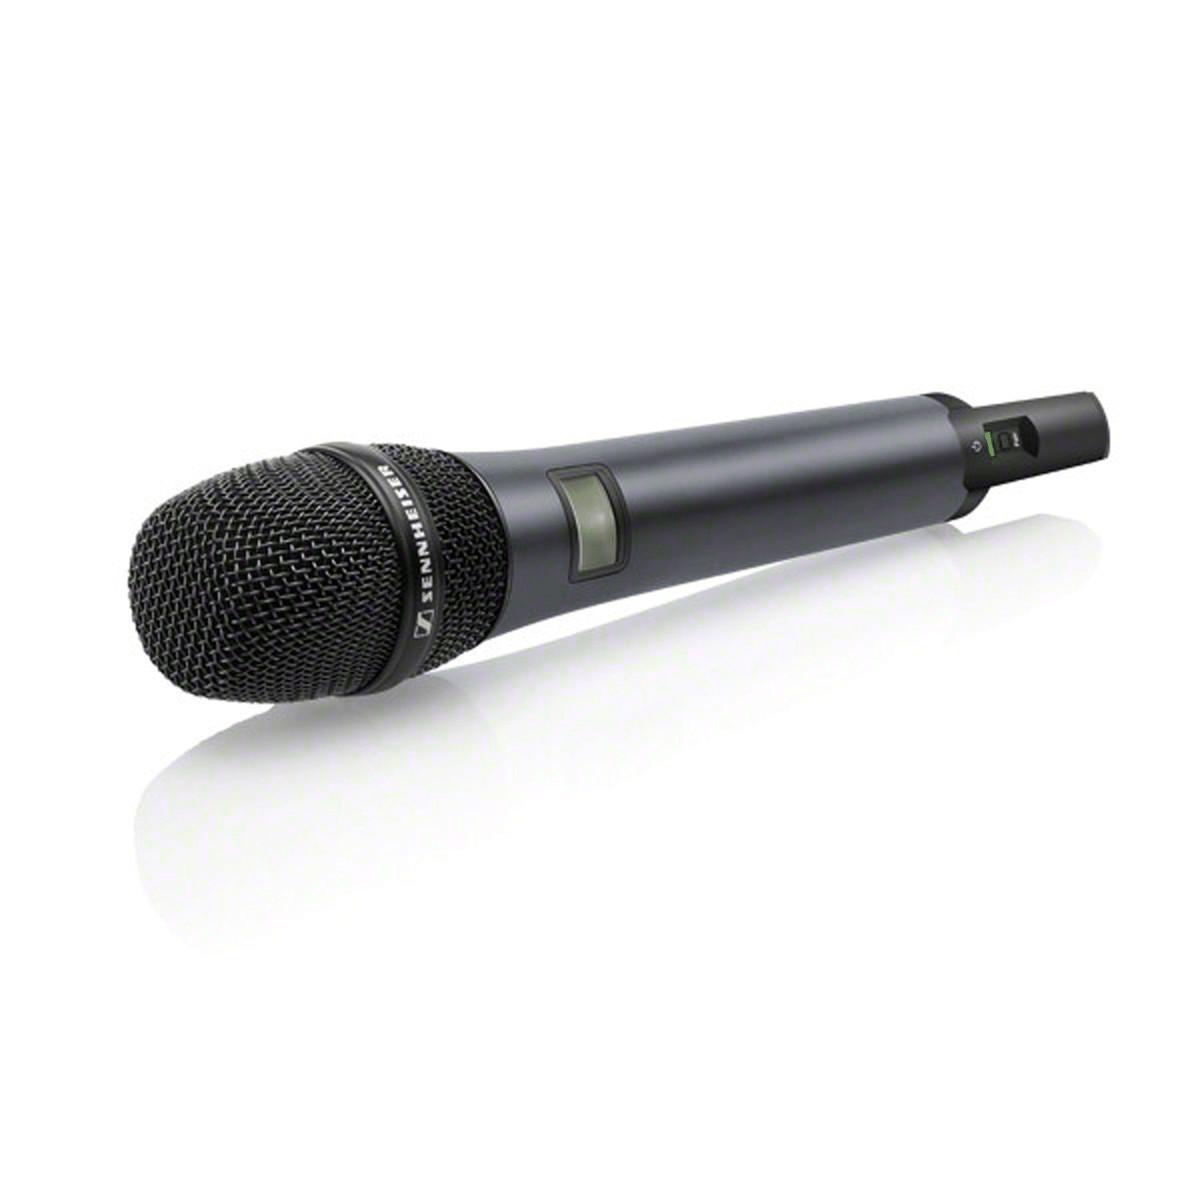 sennheiser ew d1 935 digital wireless handheld microphone system at gear4music. Black Bedroom Furniture Sets. Home Design Ideas